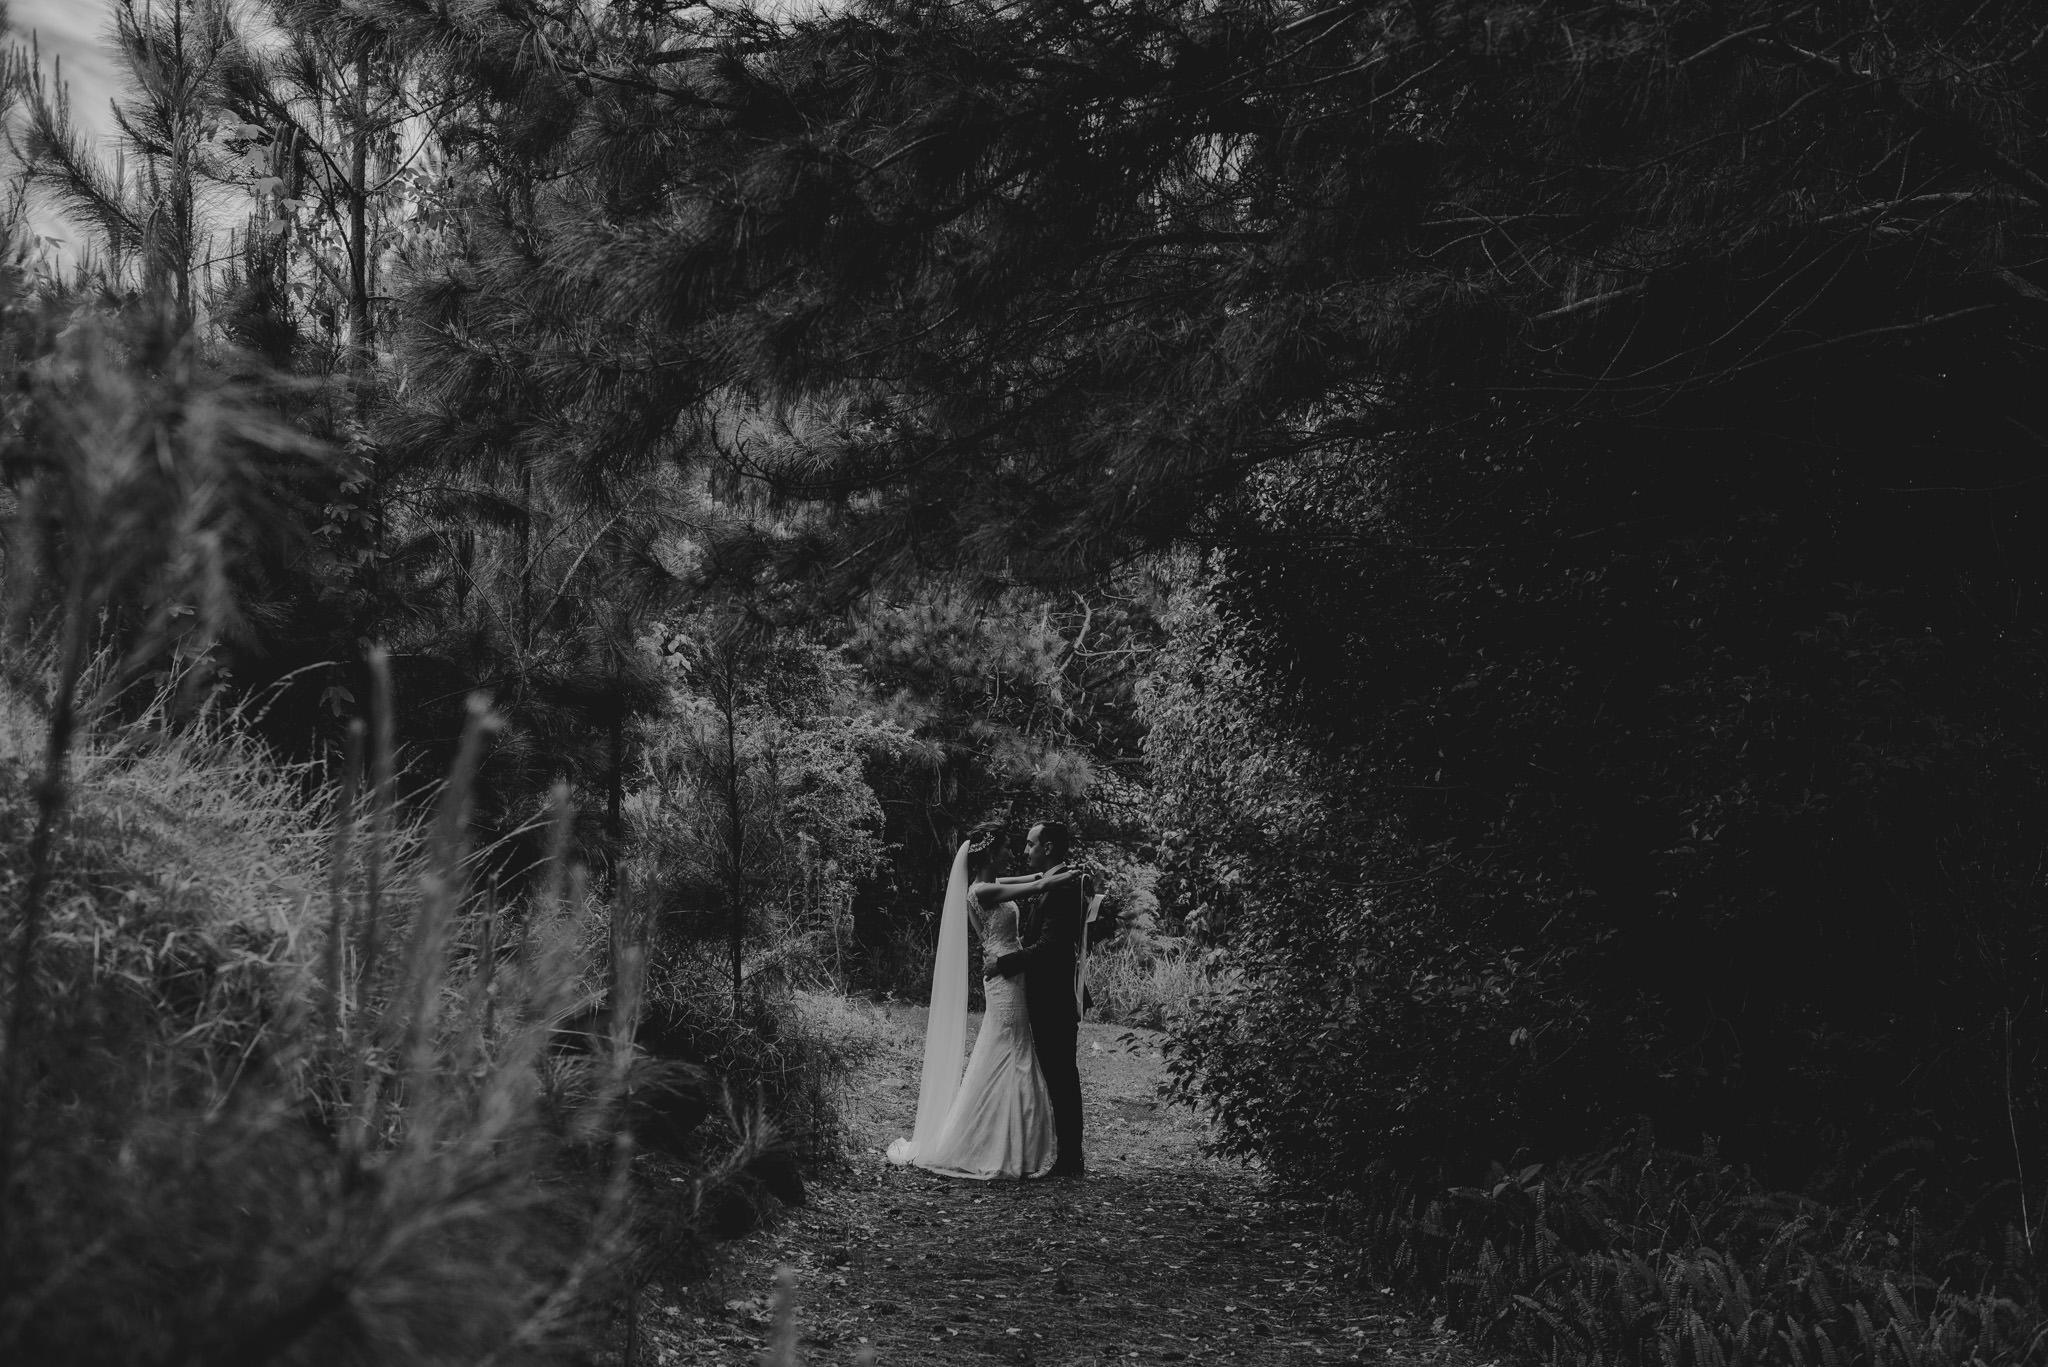 New-Black-Studios_Adam-Ward-Wedding-Photographer4.jpg